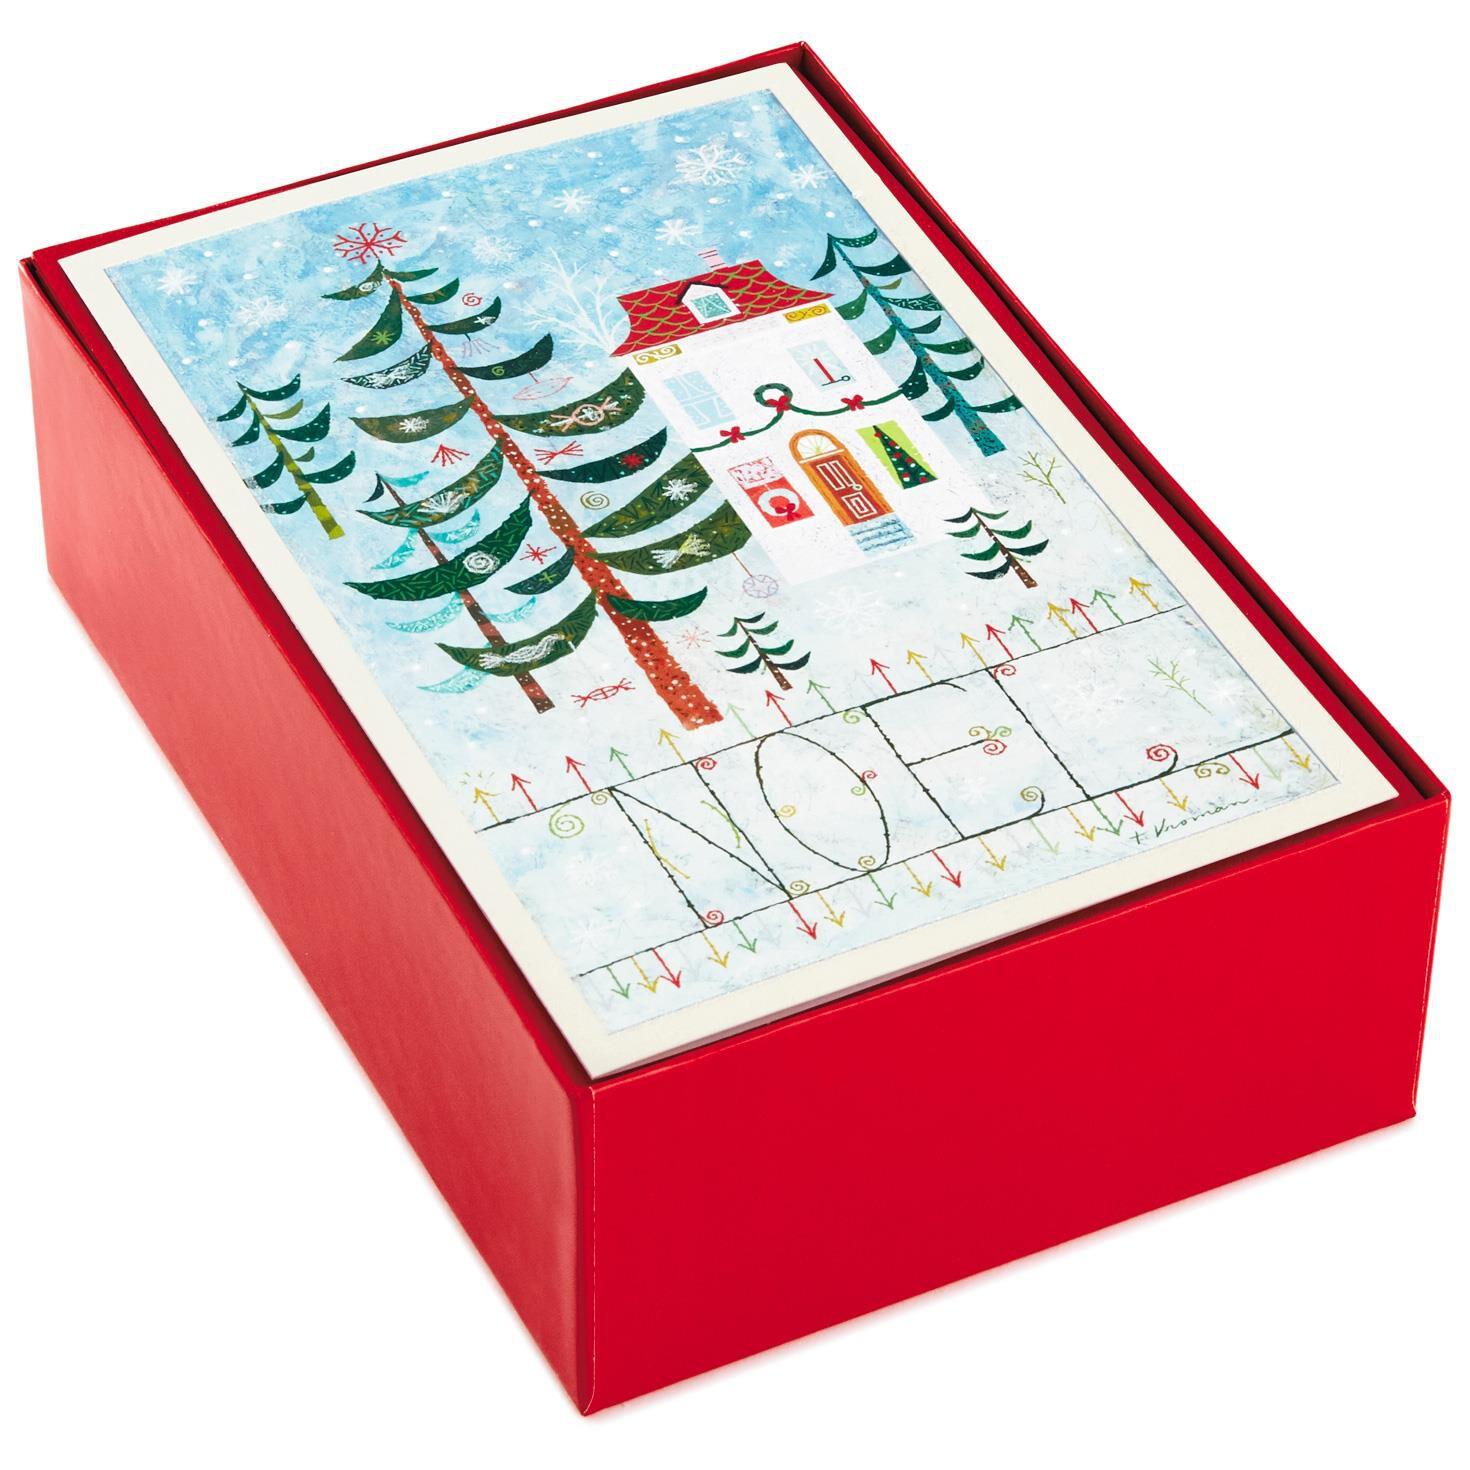 Noel Value Christmas Cards, Box of 40 - Boxed Cards - Hallmark